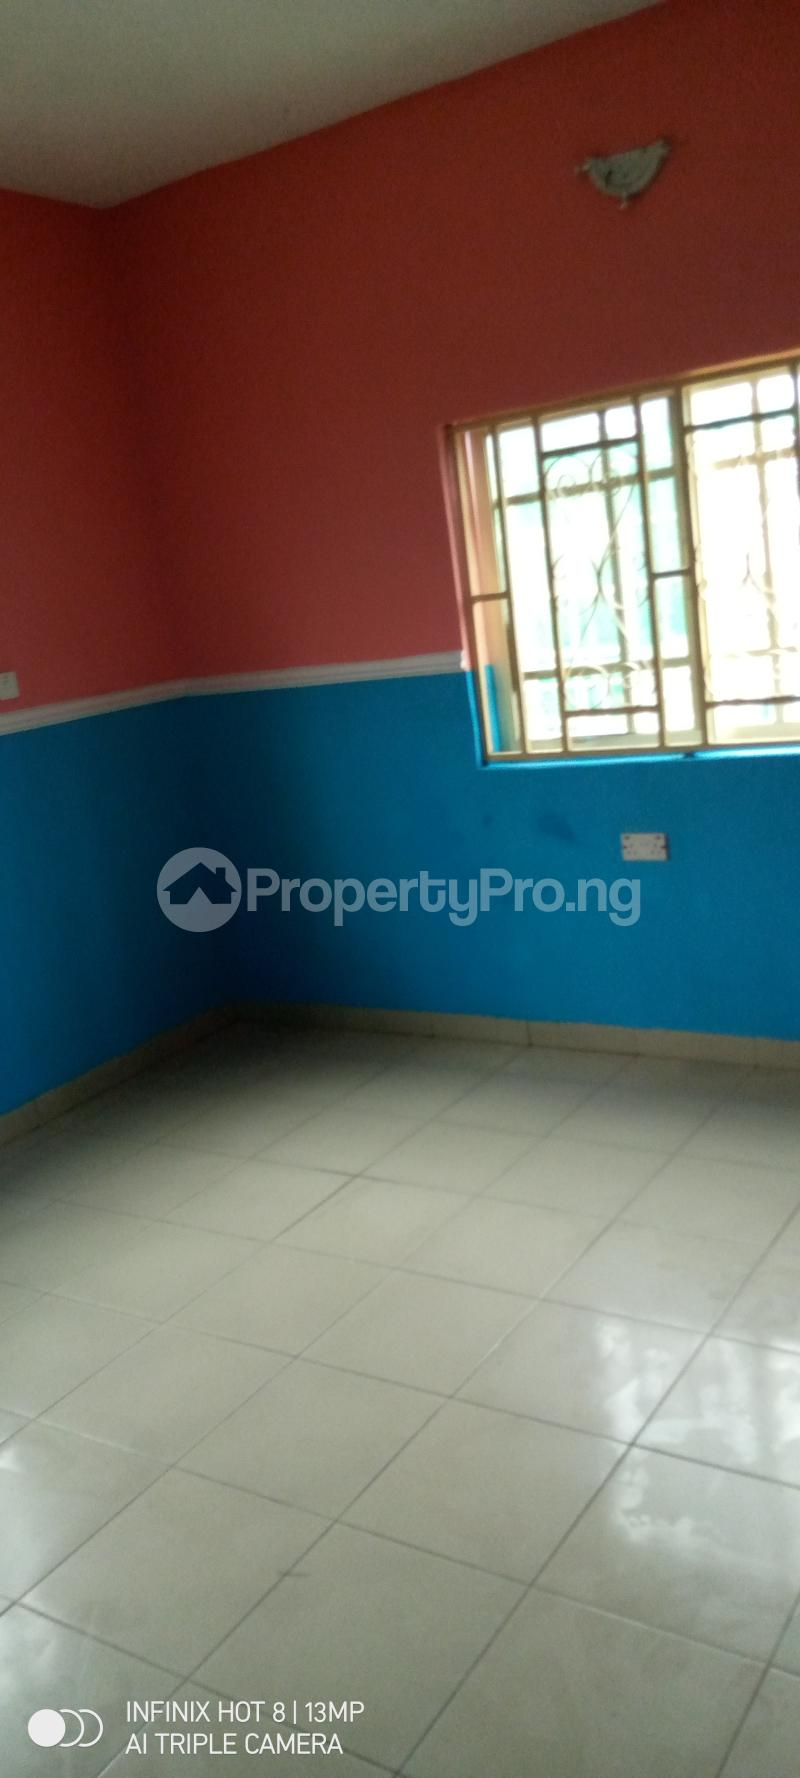 3 bedroom Flat / Apartment for rent Green field estate Amuwo Odofin Amuwo Odofin Lagos - 2